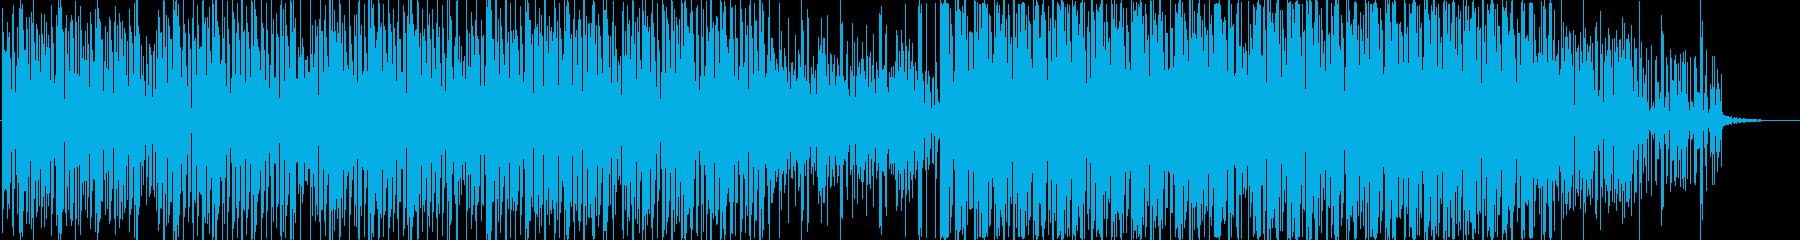 Futuristic and inorganic techno music's reproduced waveform